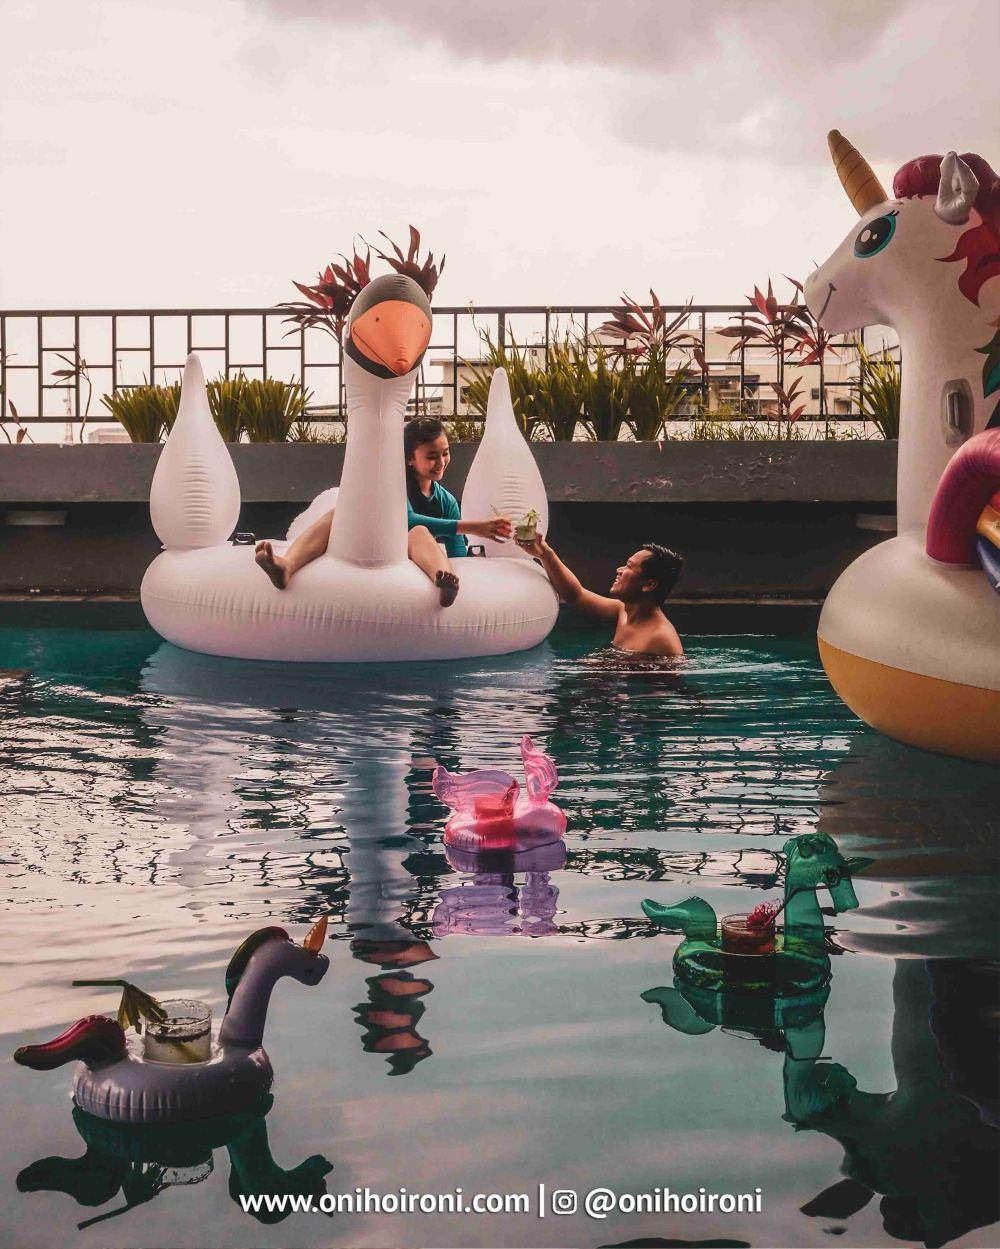 3 Swimming Pool Fave Hotel palembang Oni Hoironi